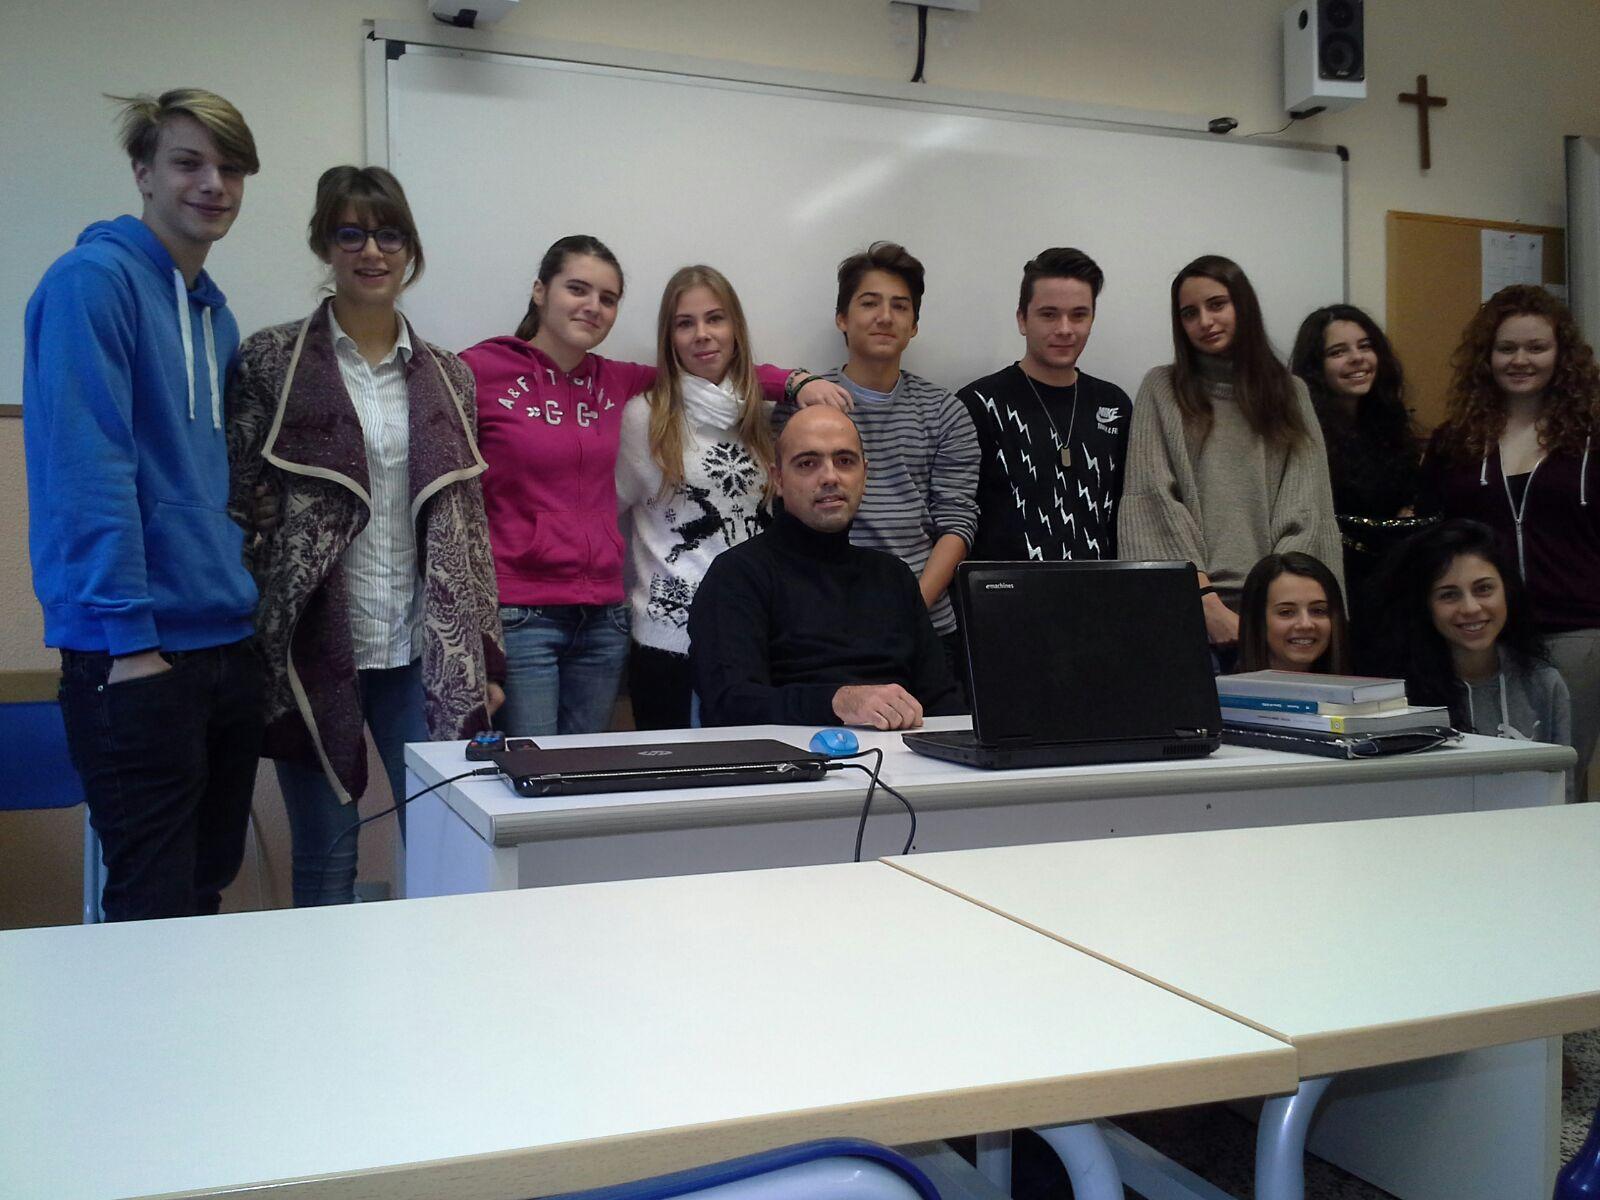 Vittorio Gaeta ze swoimi uczniami w klasie